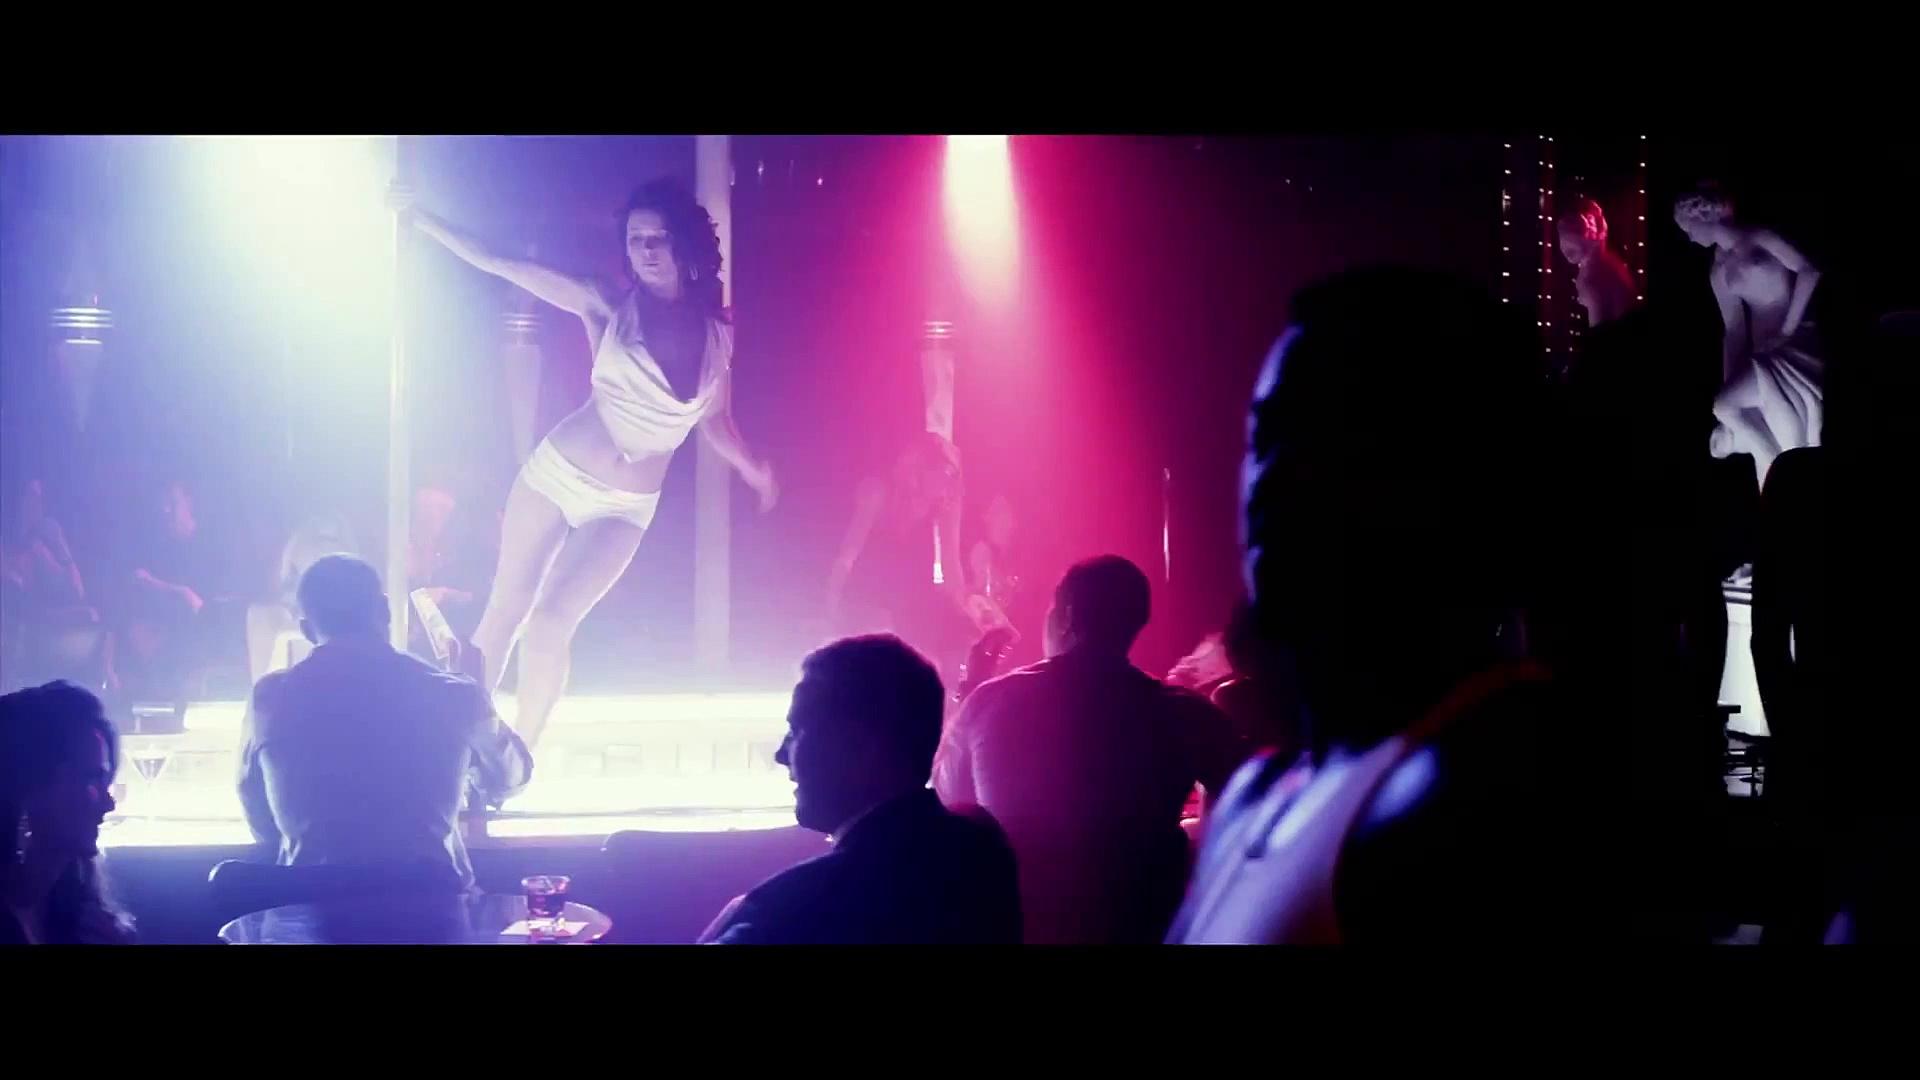 Lap Dance TRAILER 1 (2014) – Carmen Electra, Briana Evigan Drama HD